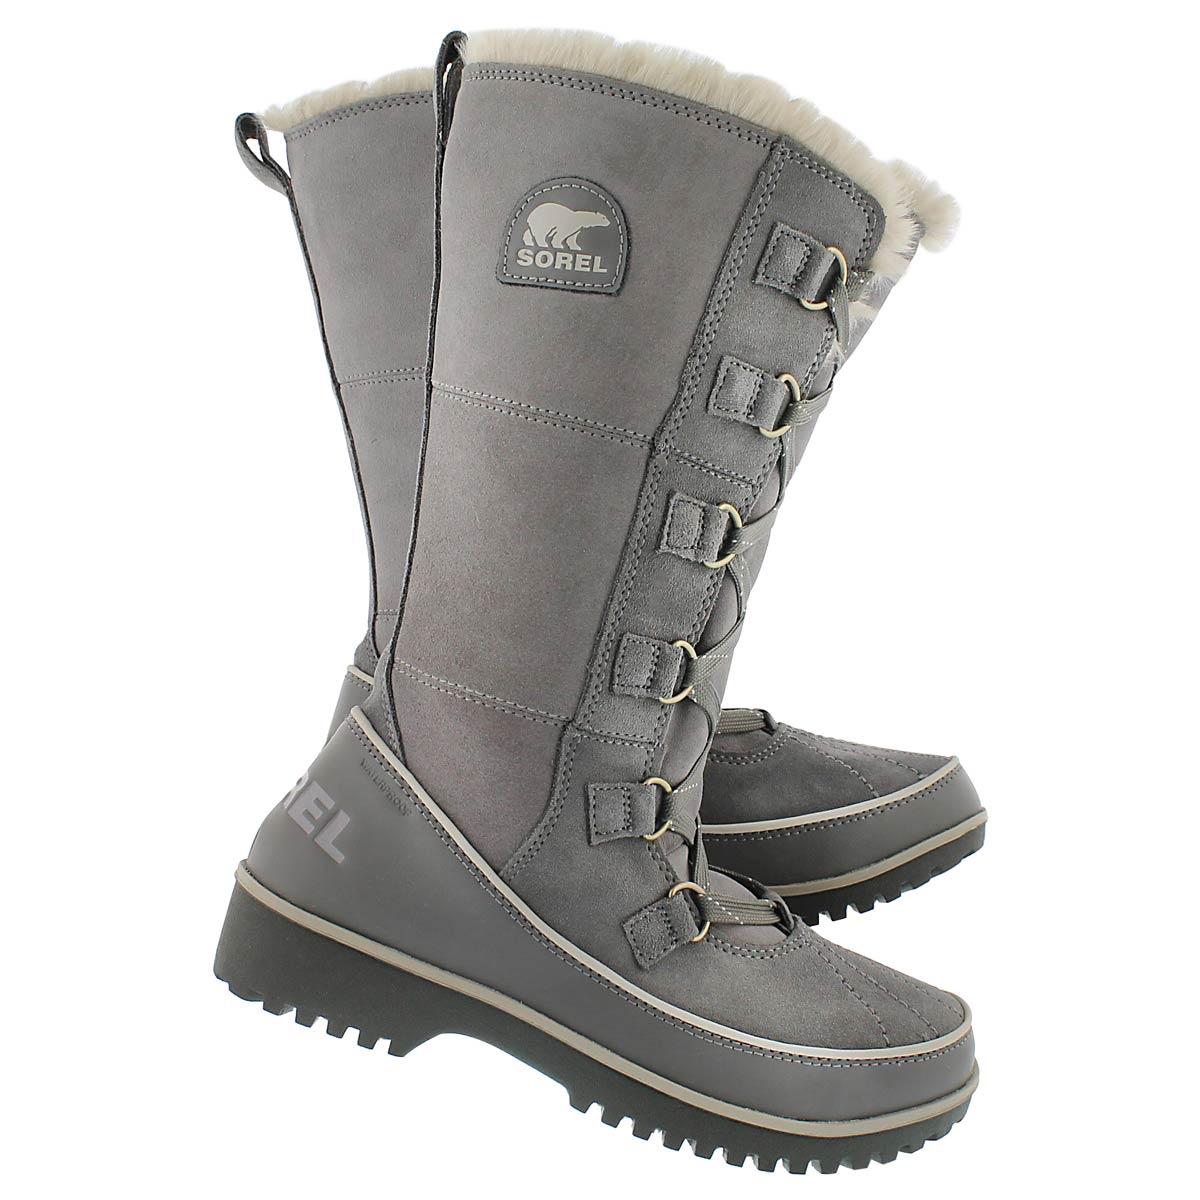 Lds Tivoli High II quarry winter boot